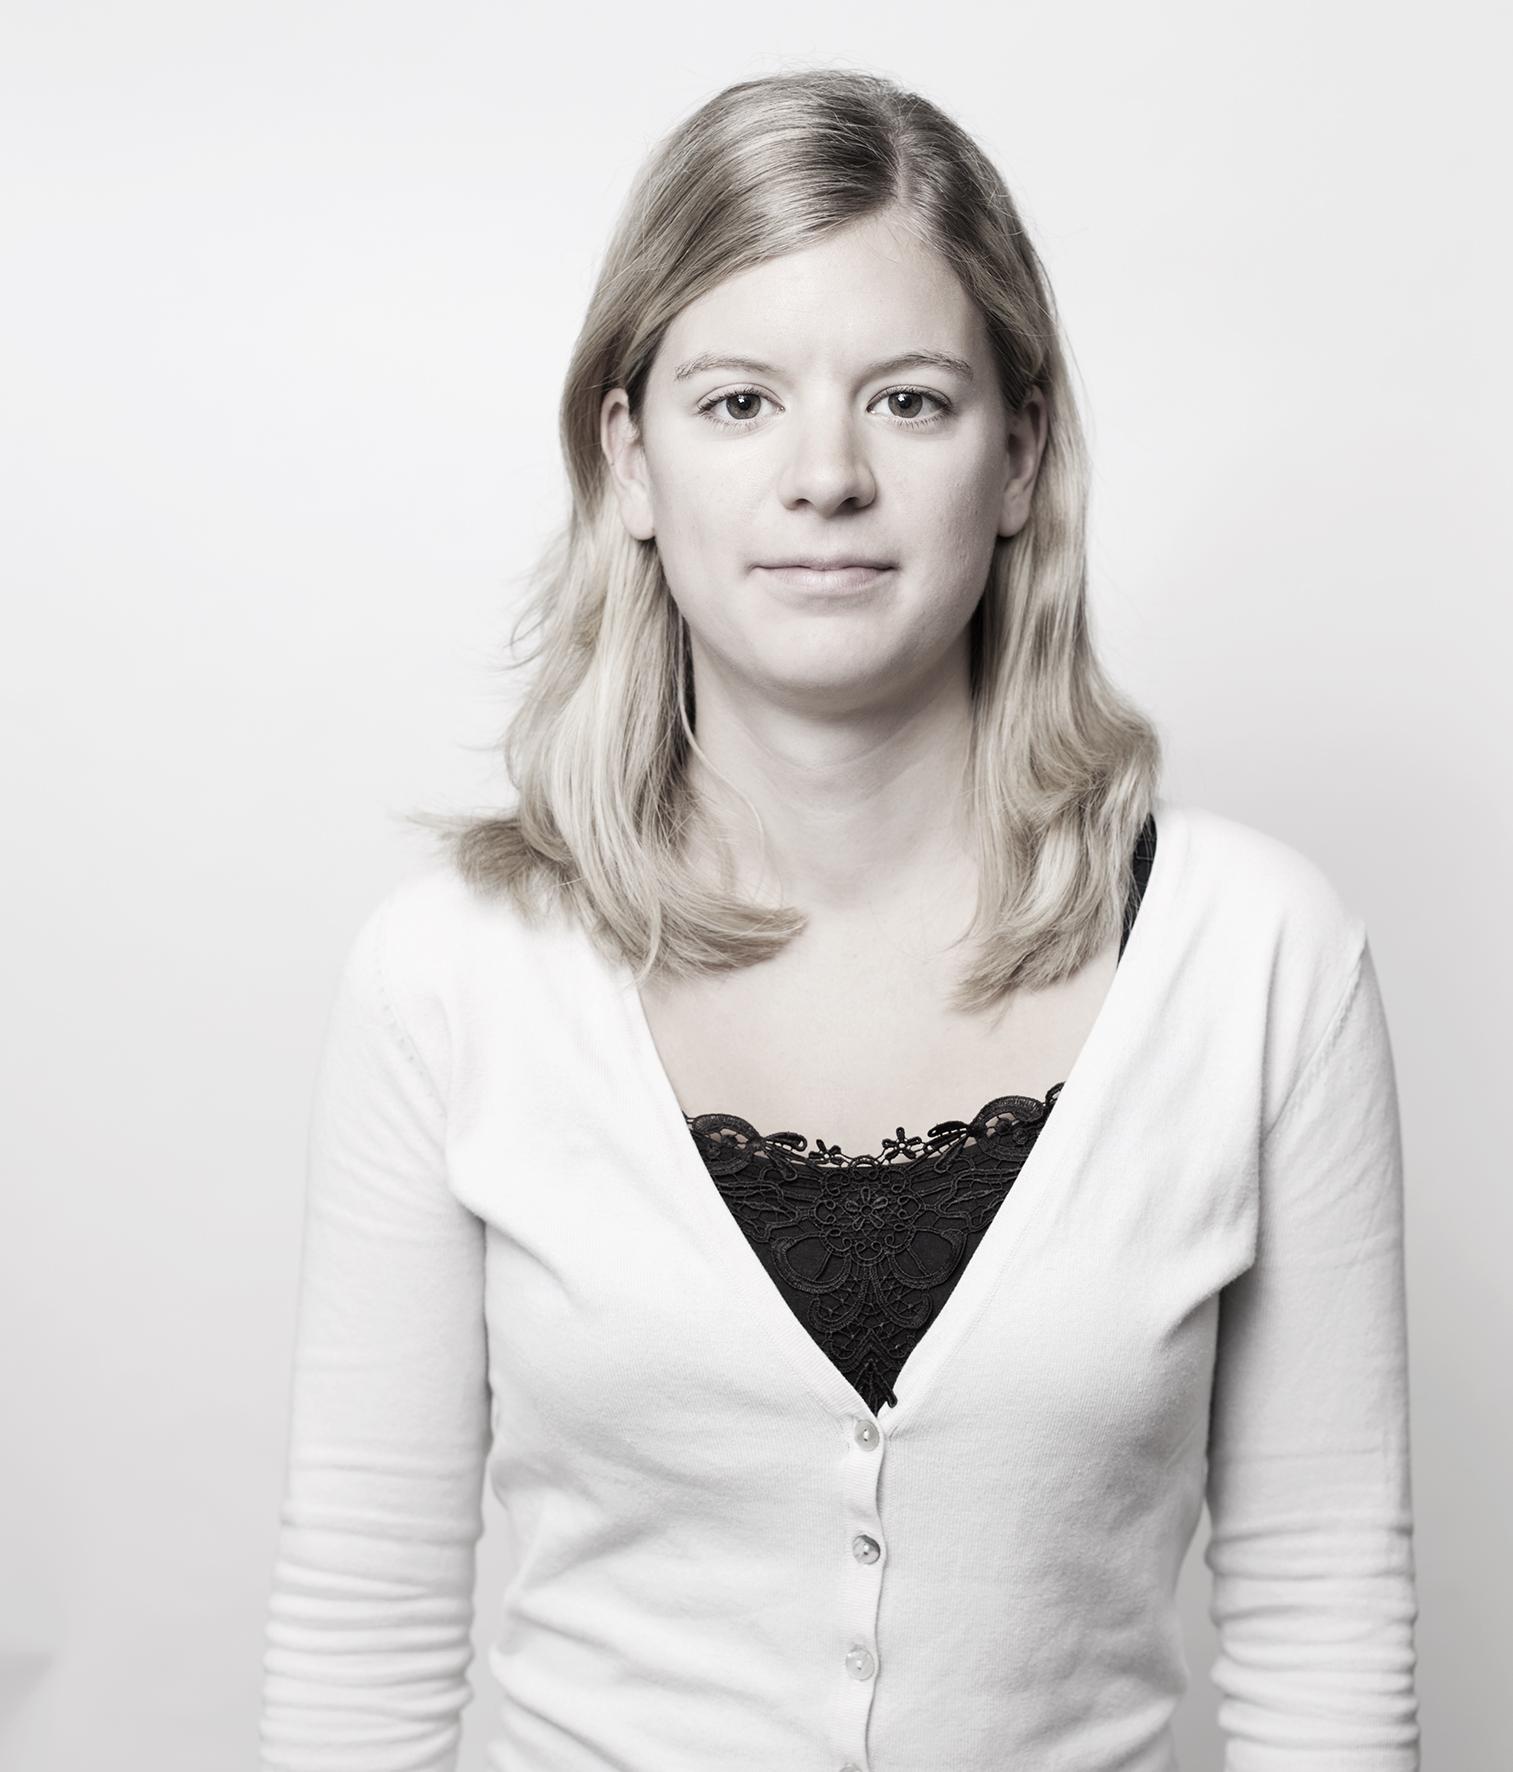 07-MarijkeOlthof-01.jpg